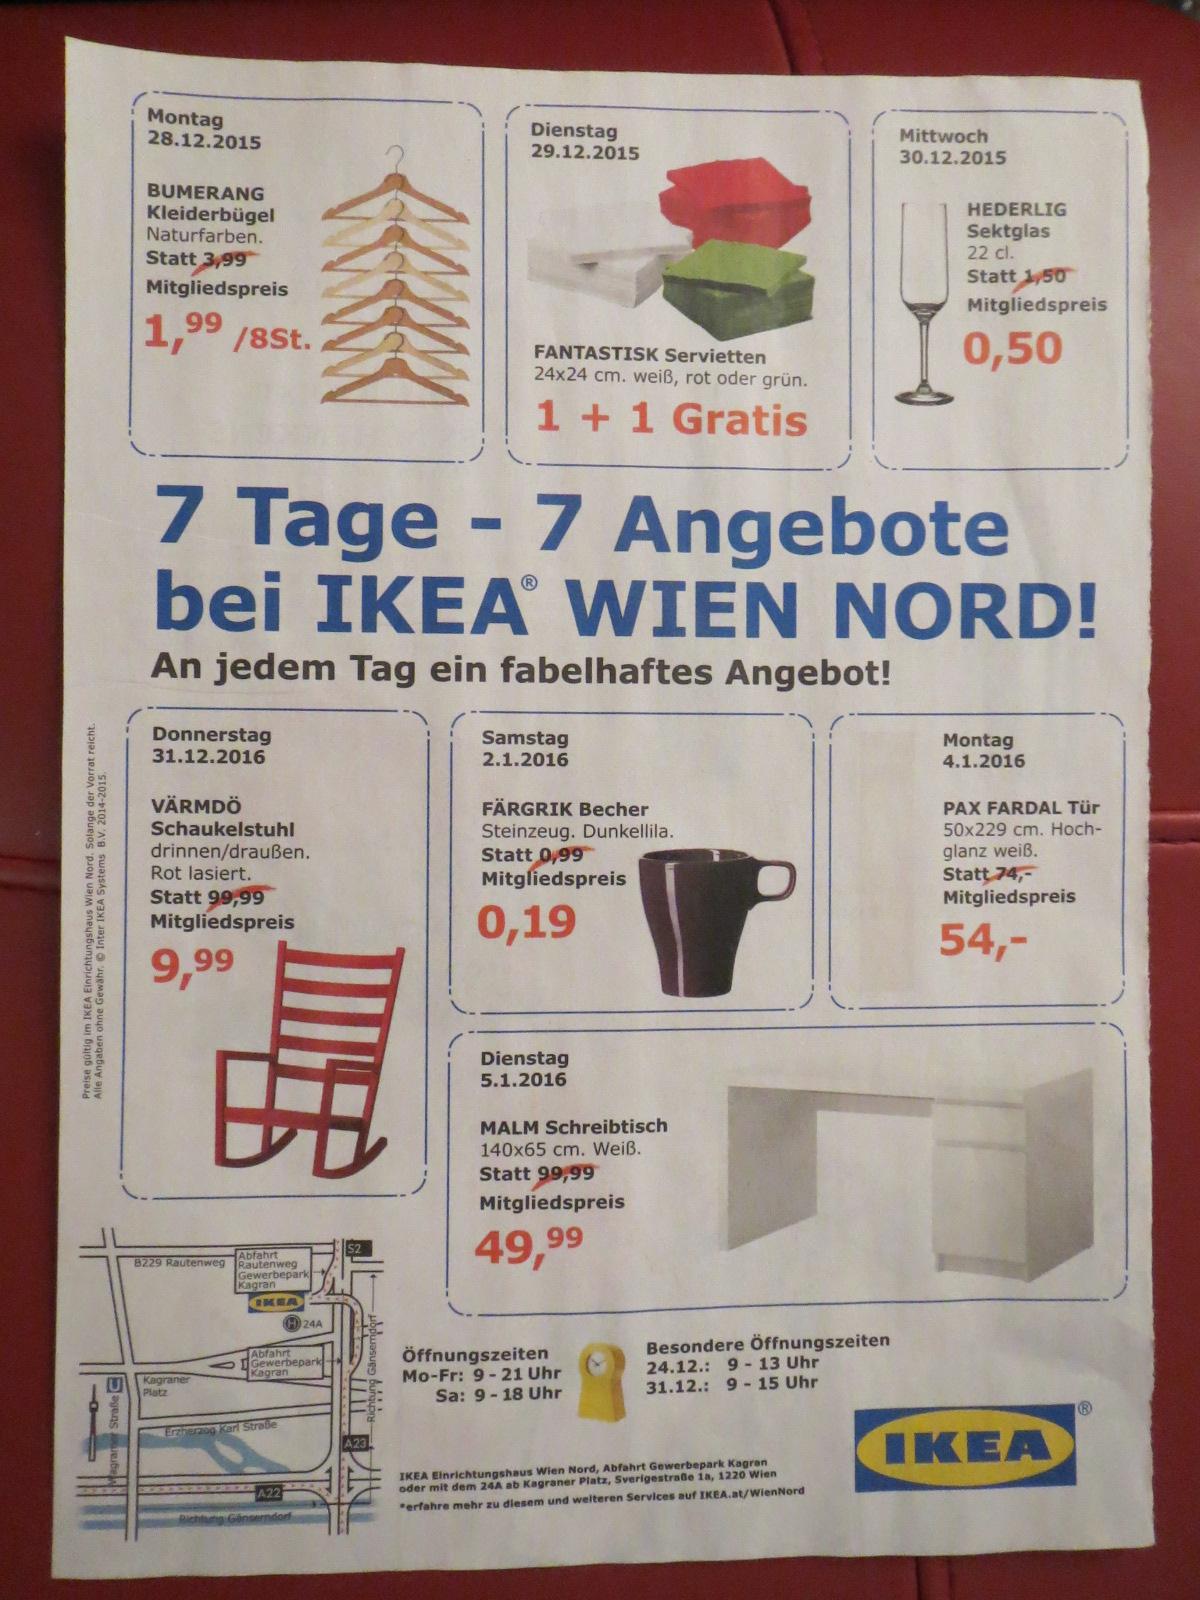 Schaukelstuhl 9,99 | 7 Tage - 7 Angebote bei IKEA Wien Nord